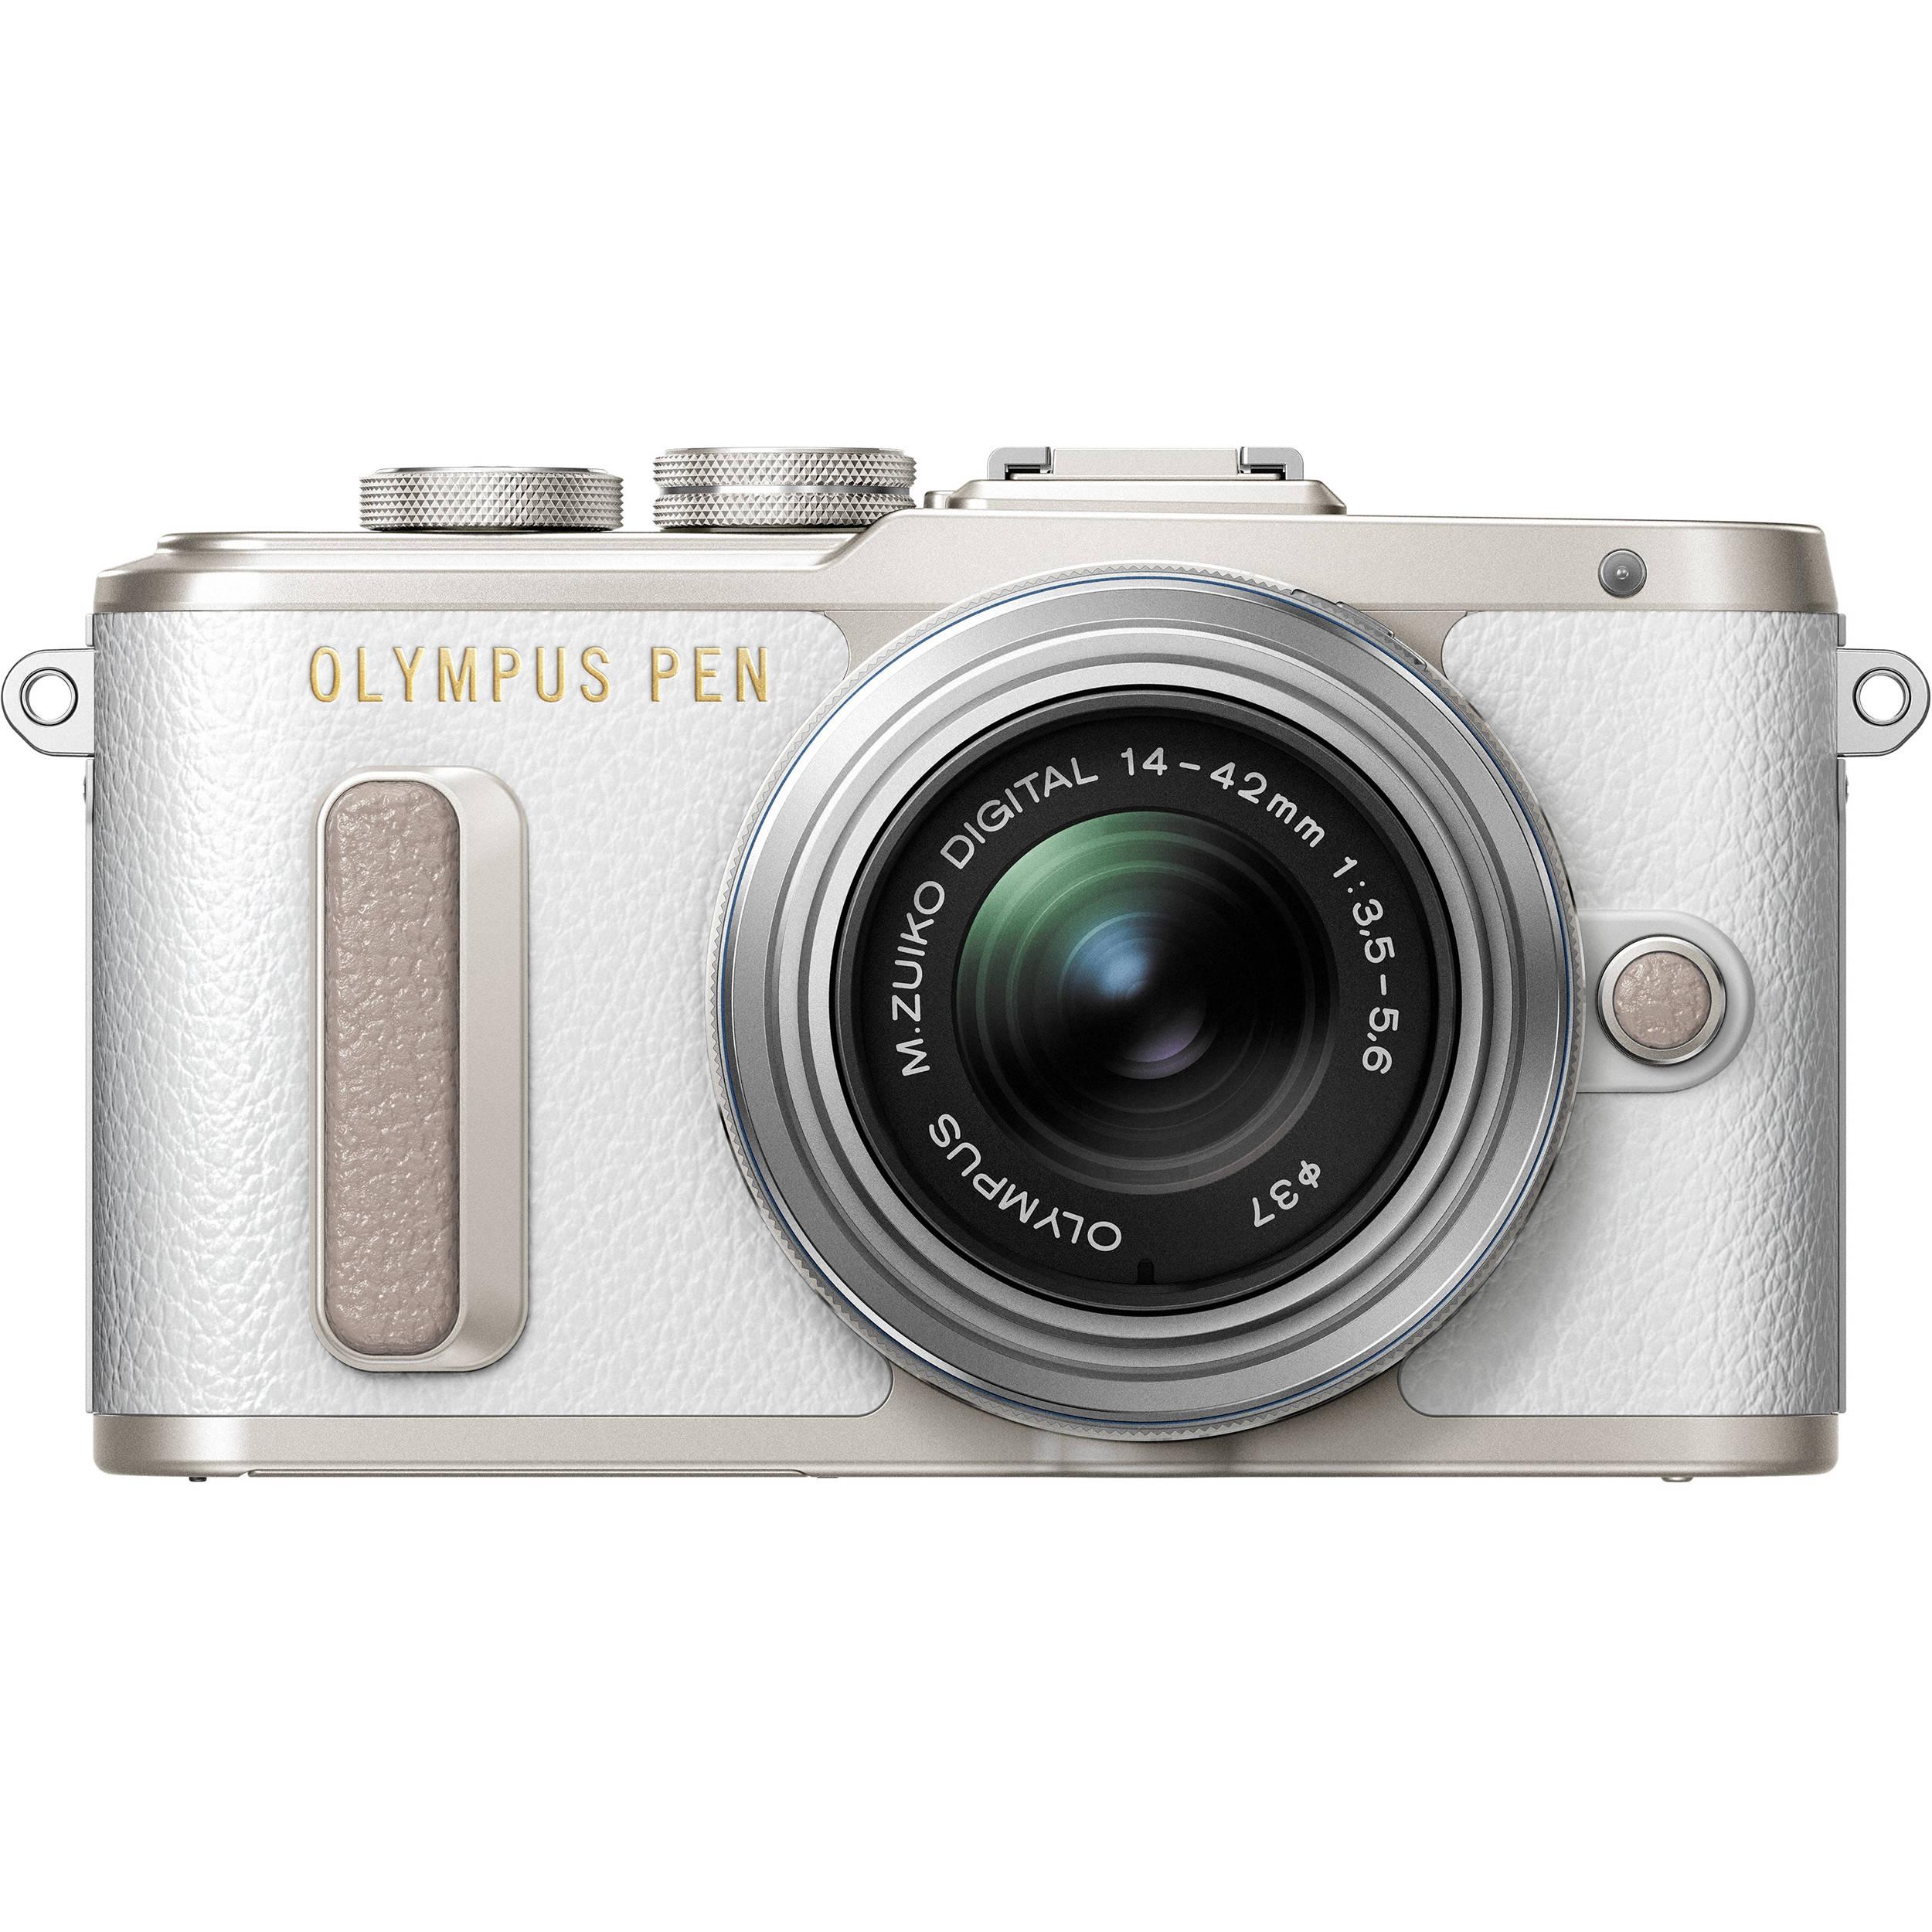 Olympus PEN E-PL8 Mirrorless Micro Four Thirds V205081WU000 B&H